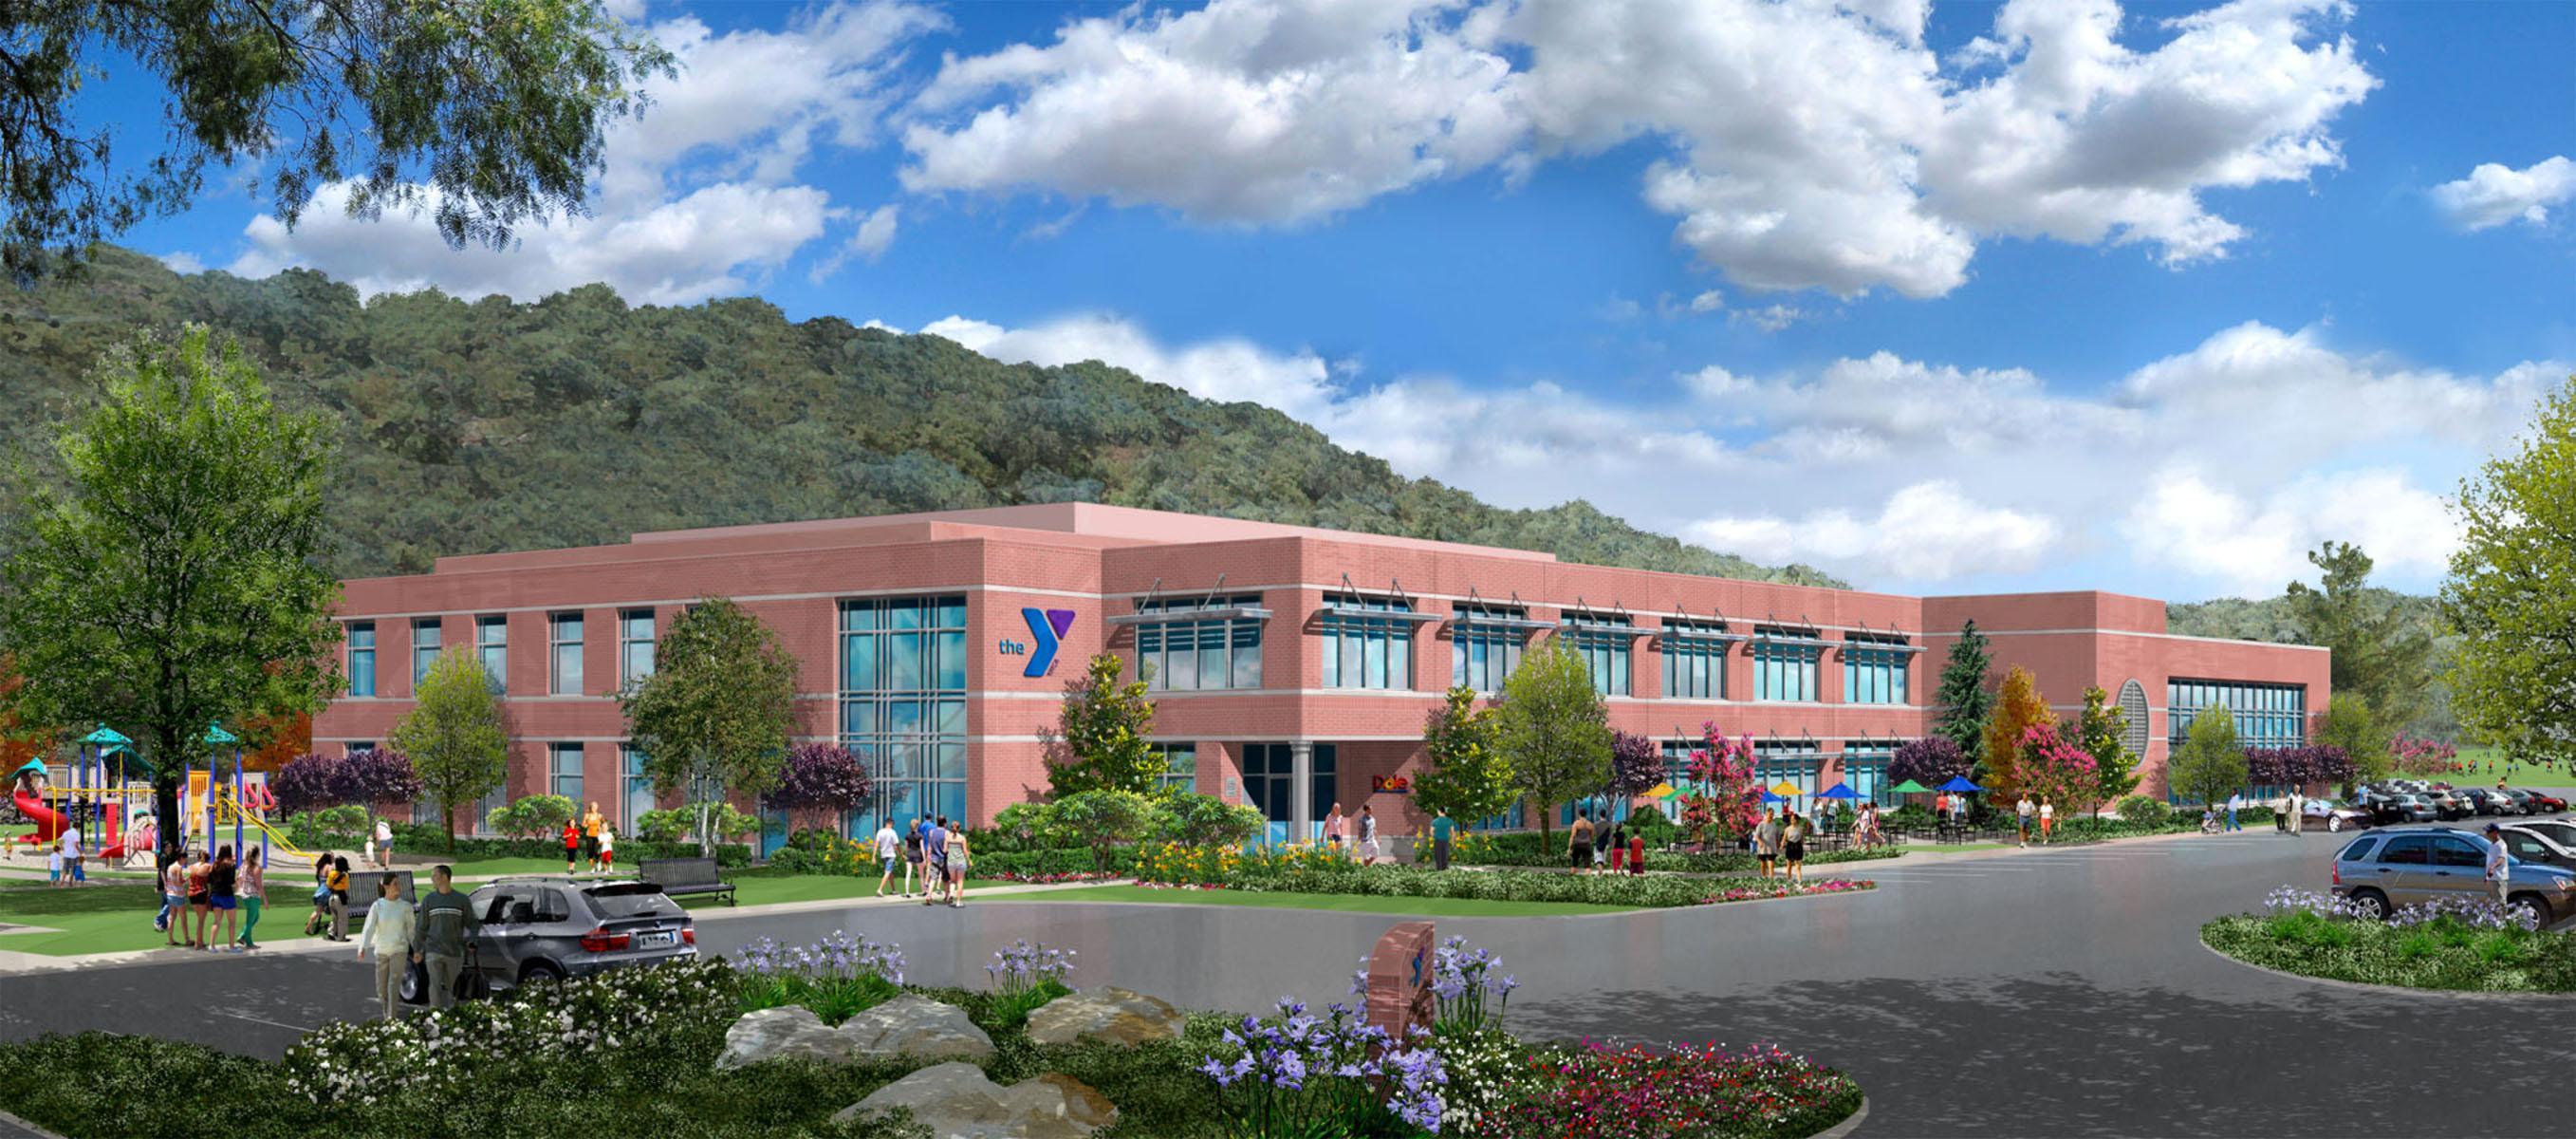 YMCA Westlake Village, CA